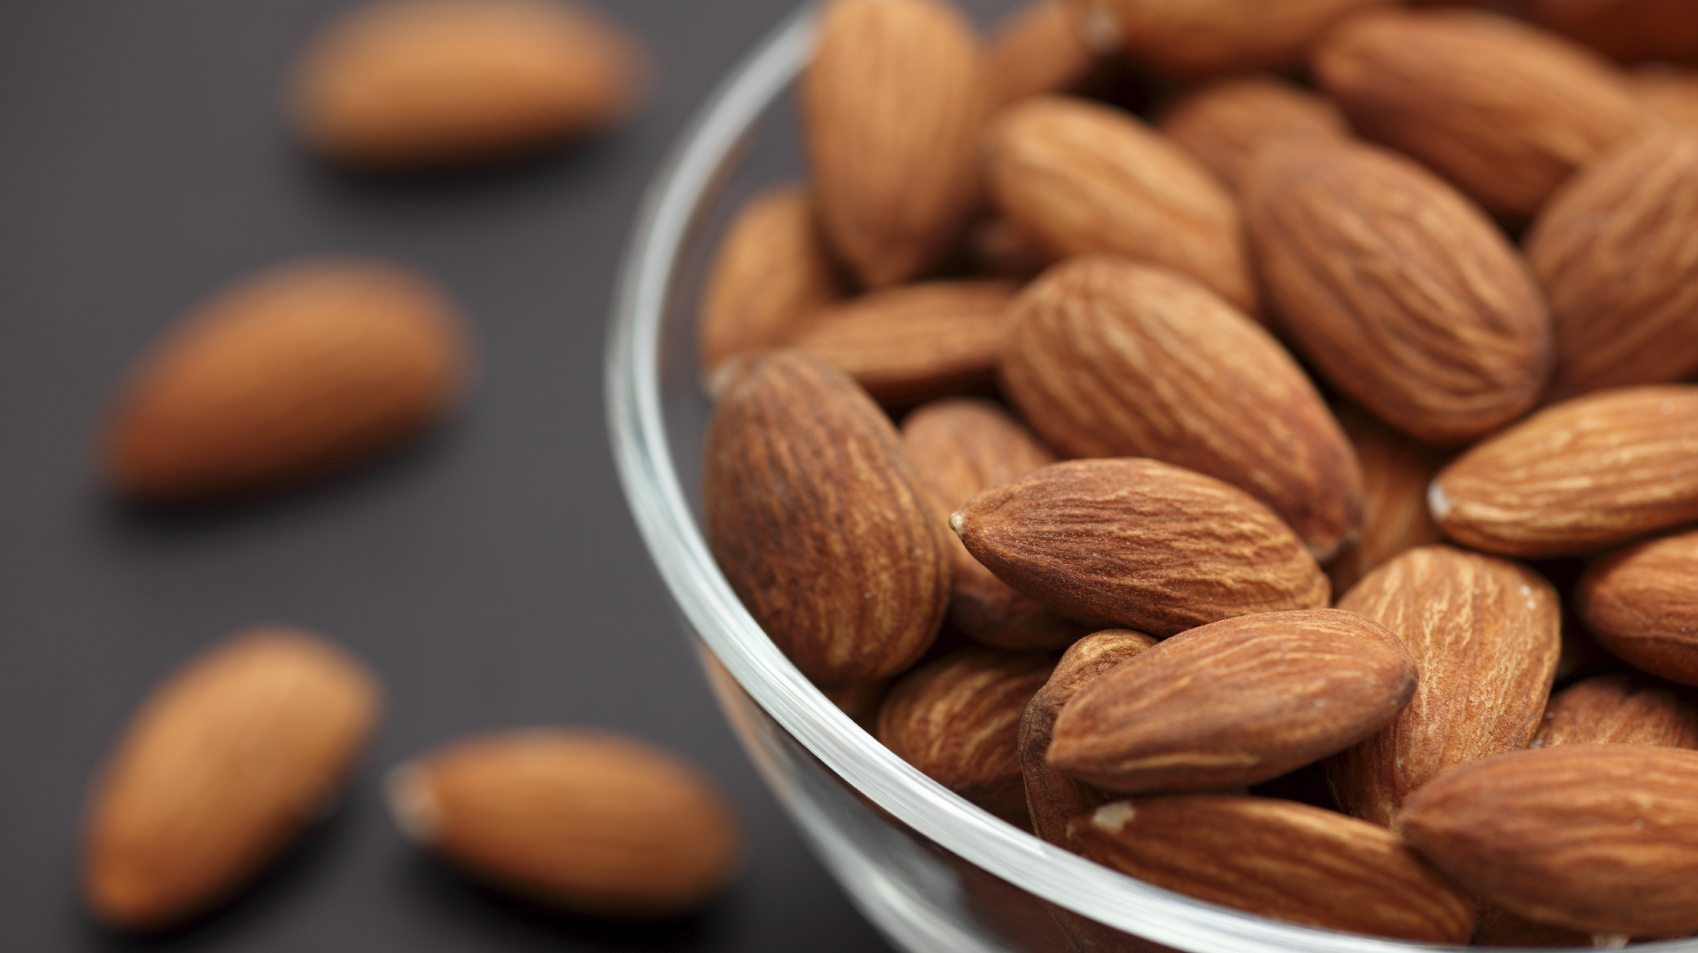 News: Almonds Have 20 Percent Fewer Calories